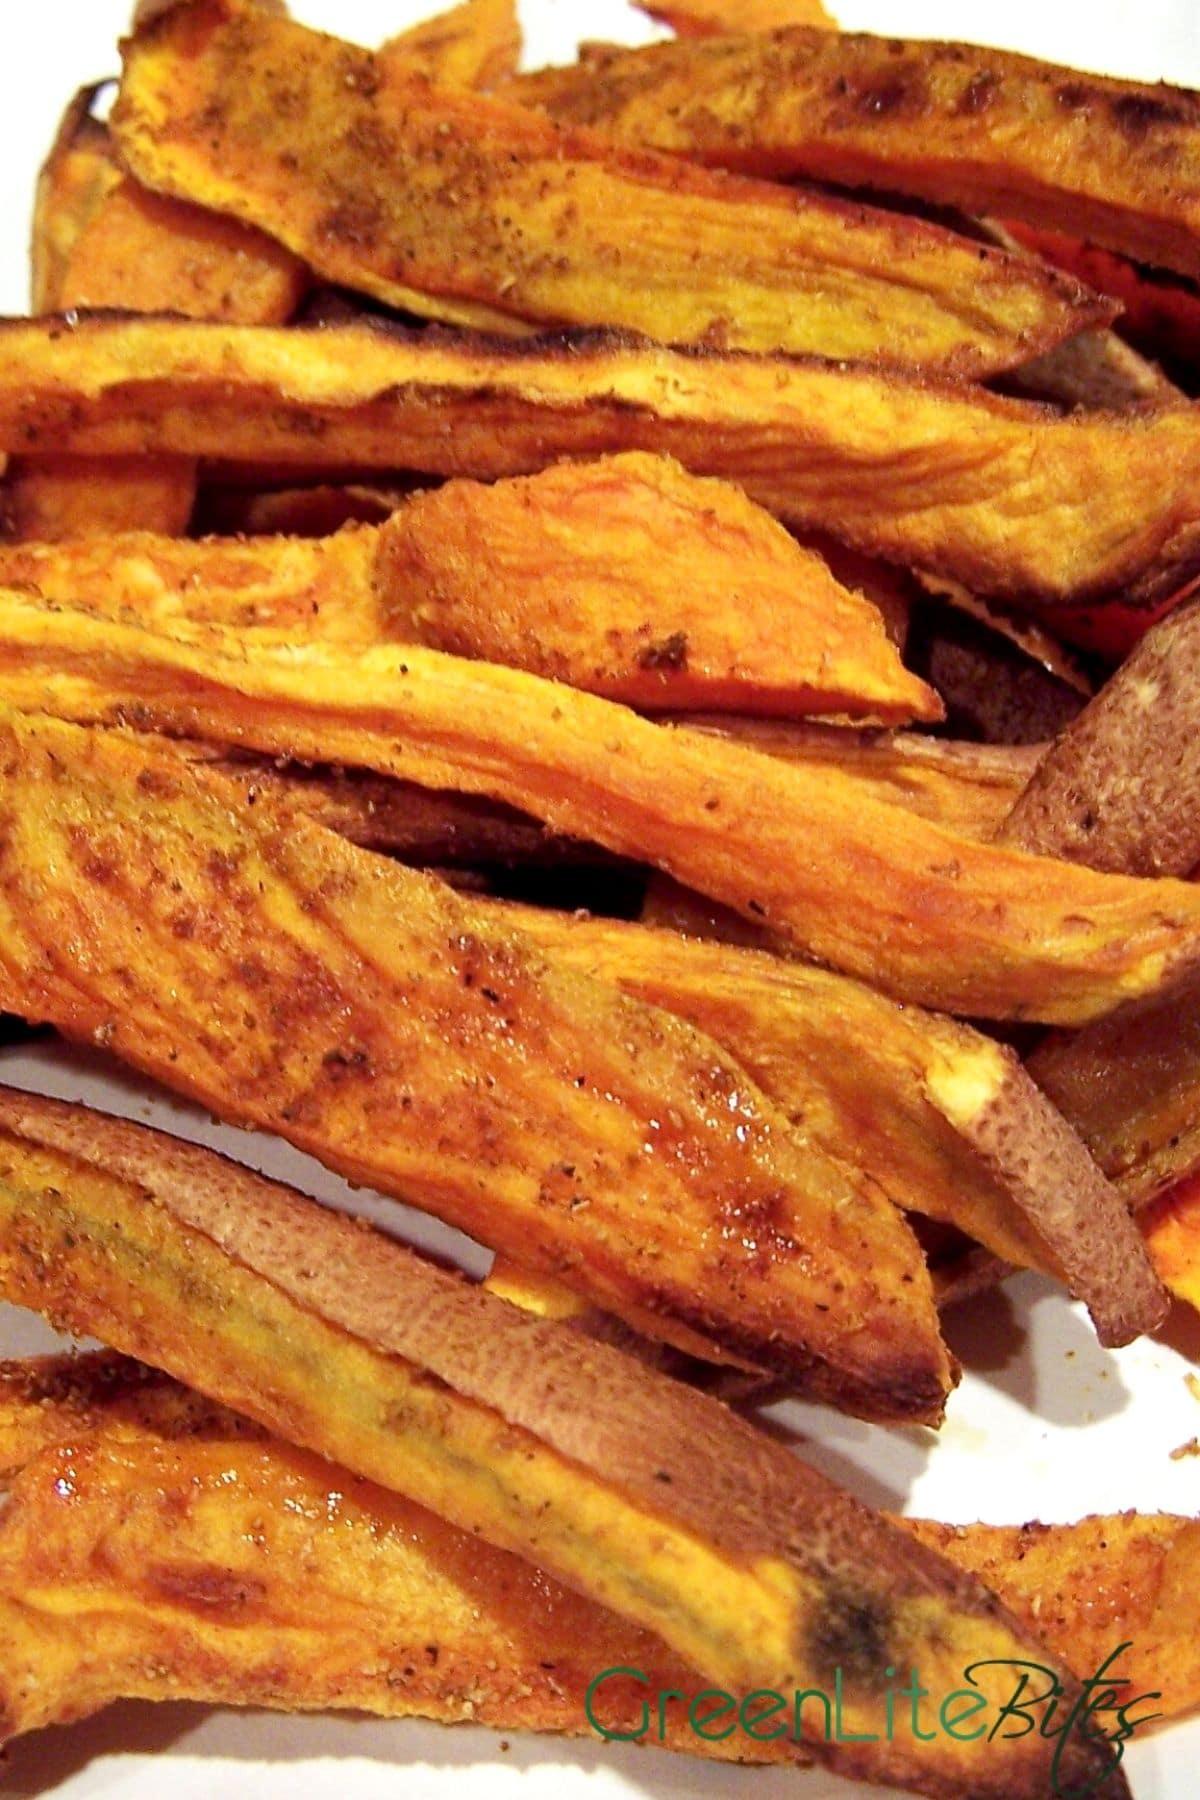 Swet potato fries on plate